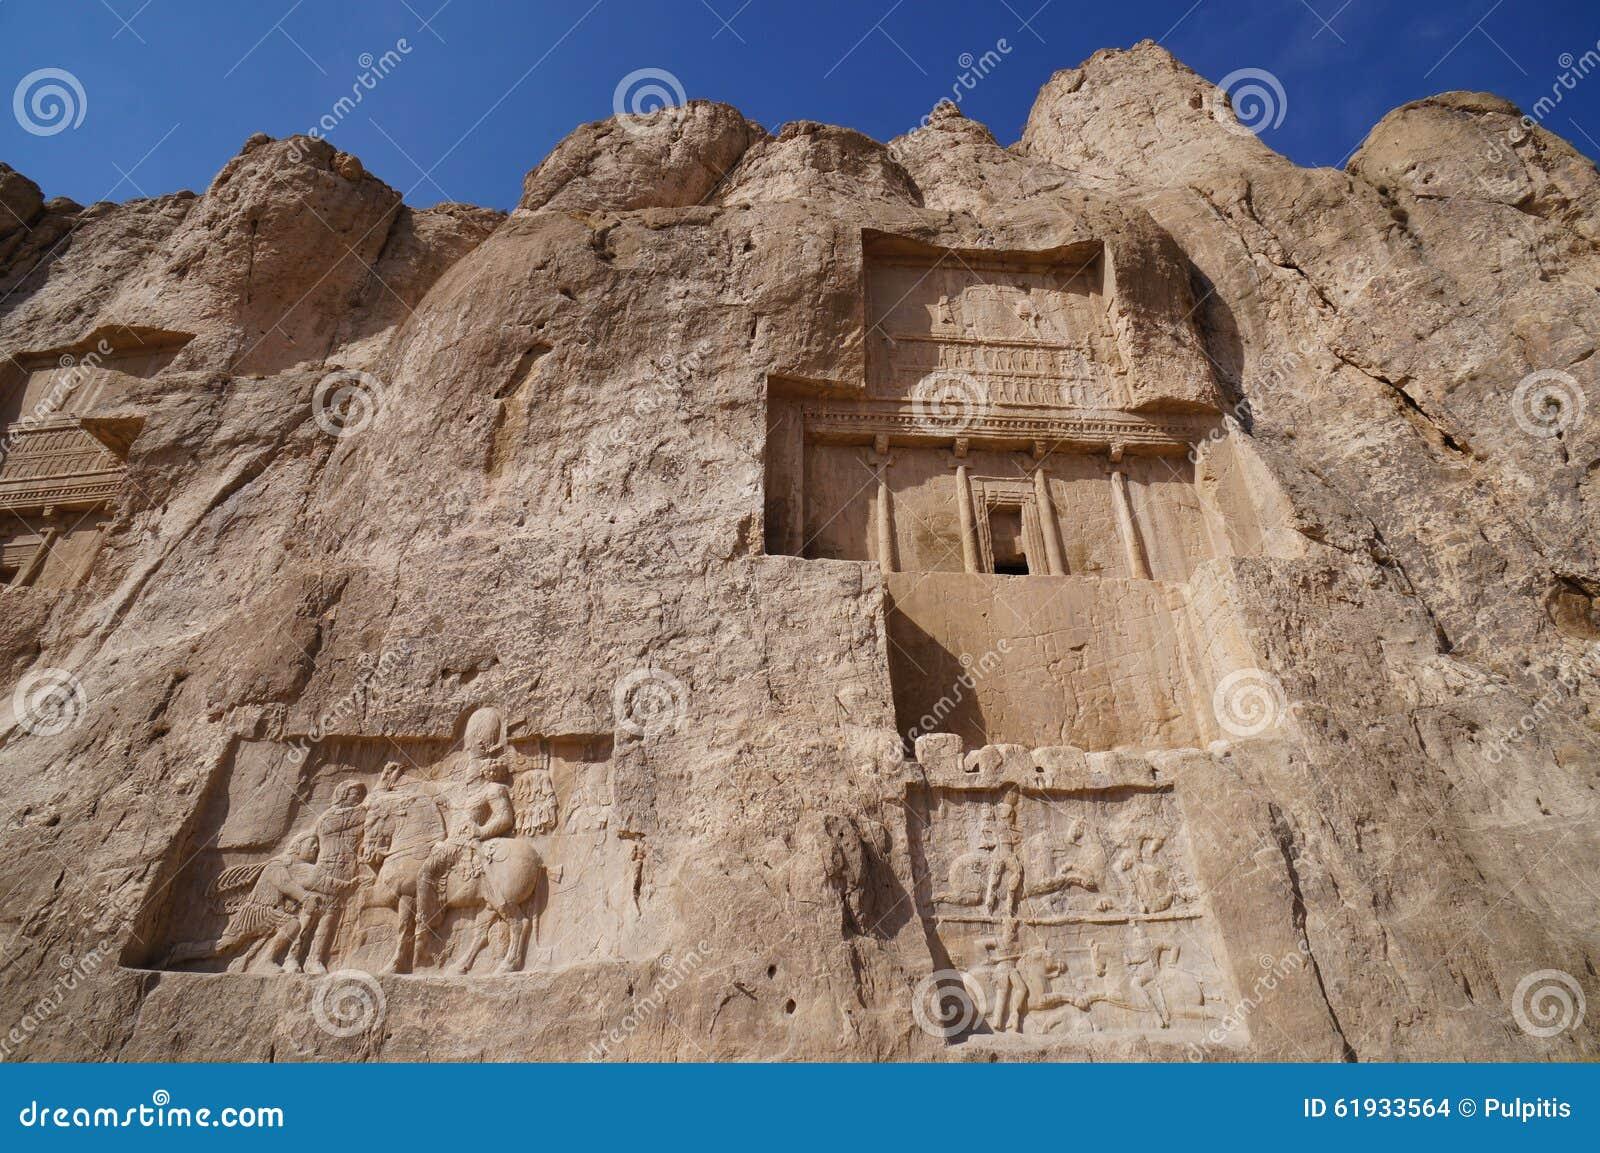 Stone carvings on tomb of darius the great persepolis